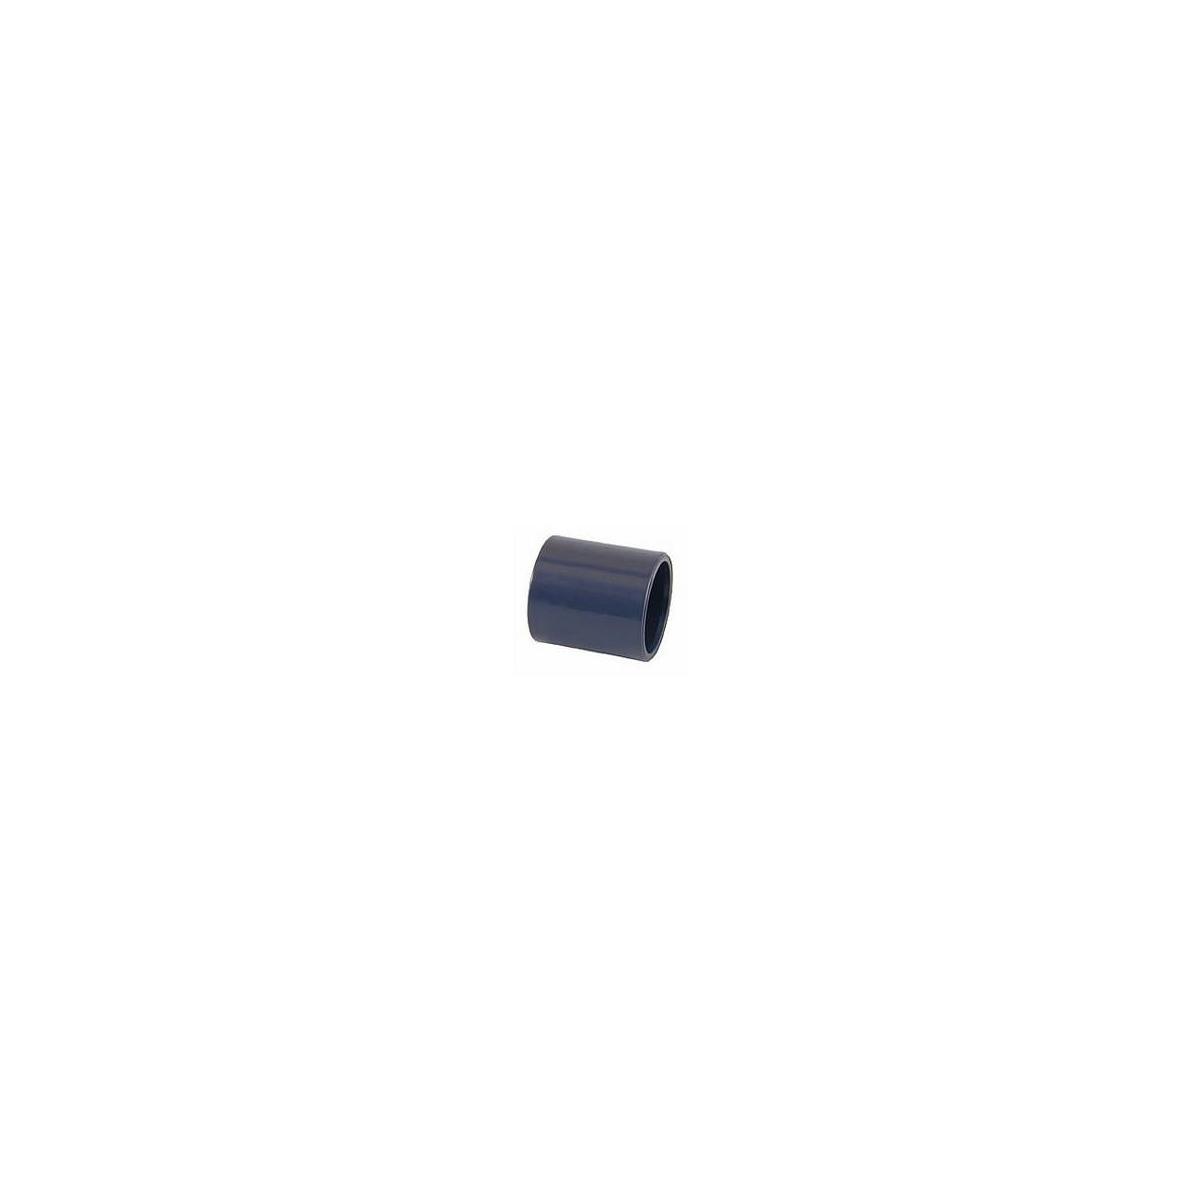 PVC SOCKET solvent socket